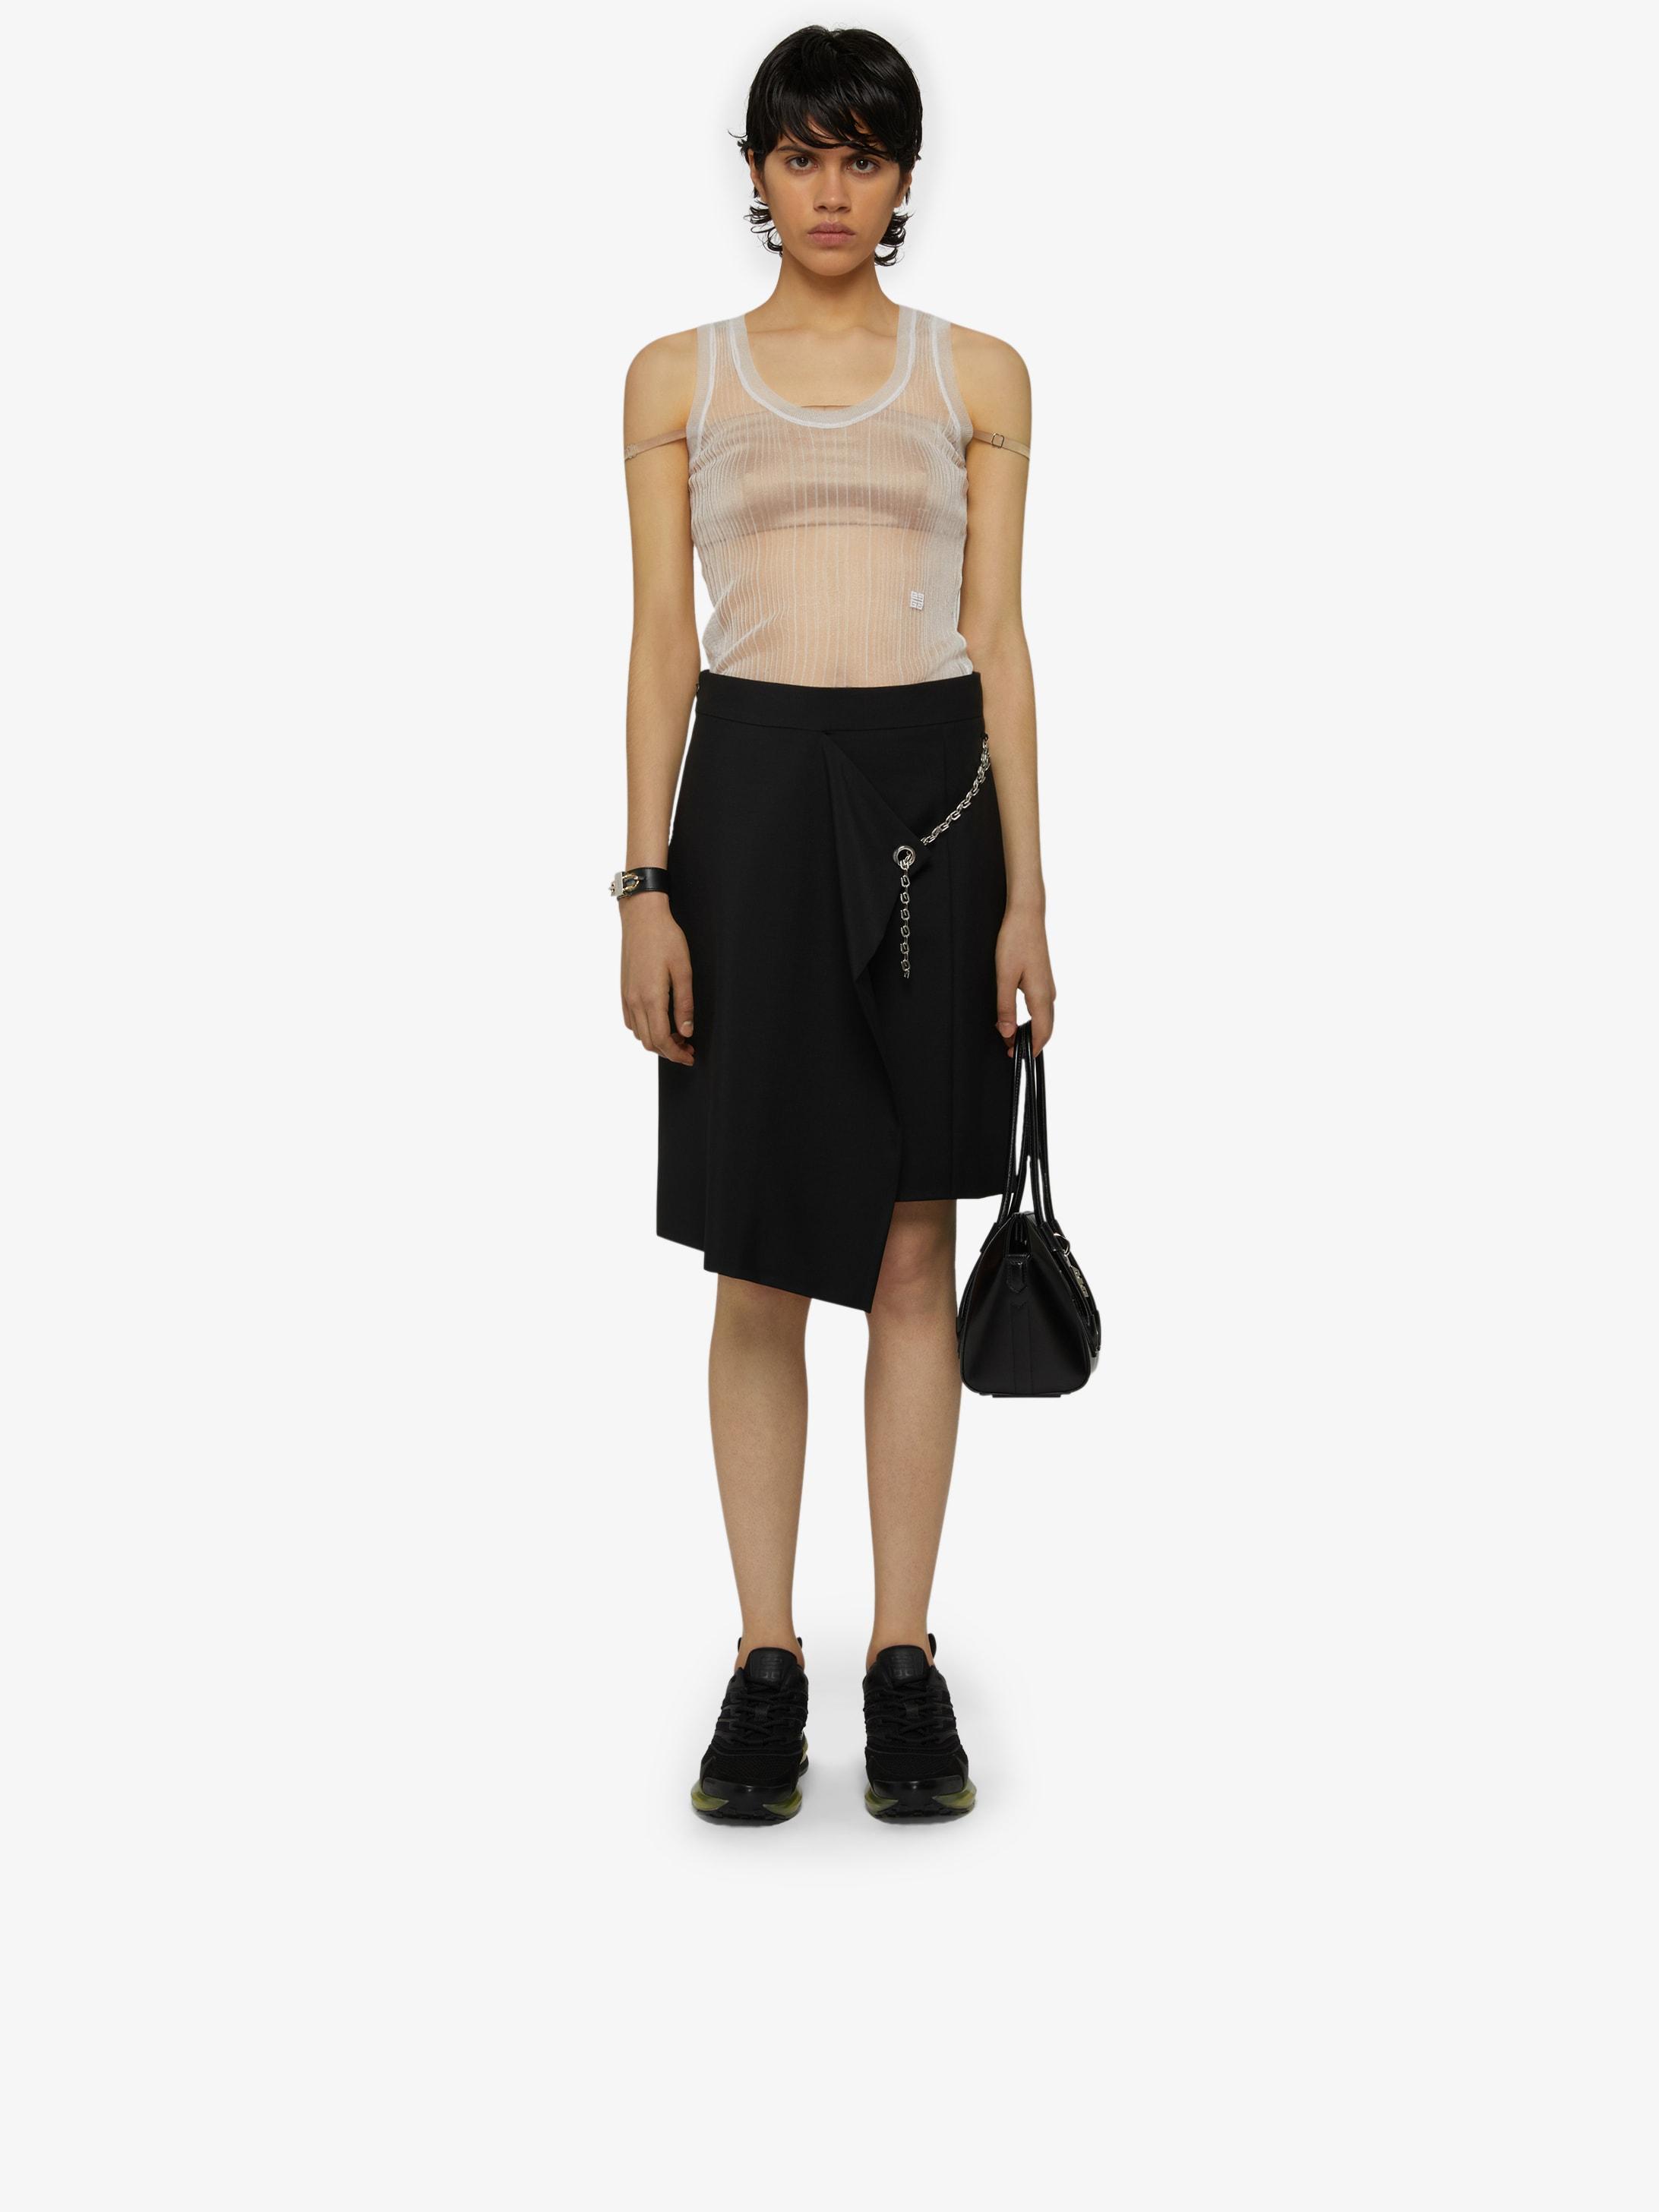 Asymmetrical wrap skirt with metallic details